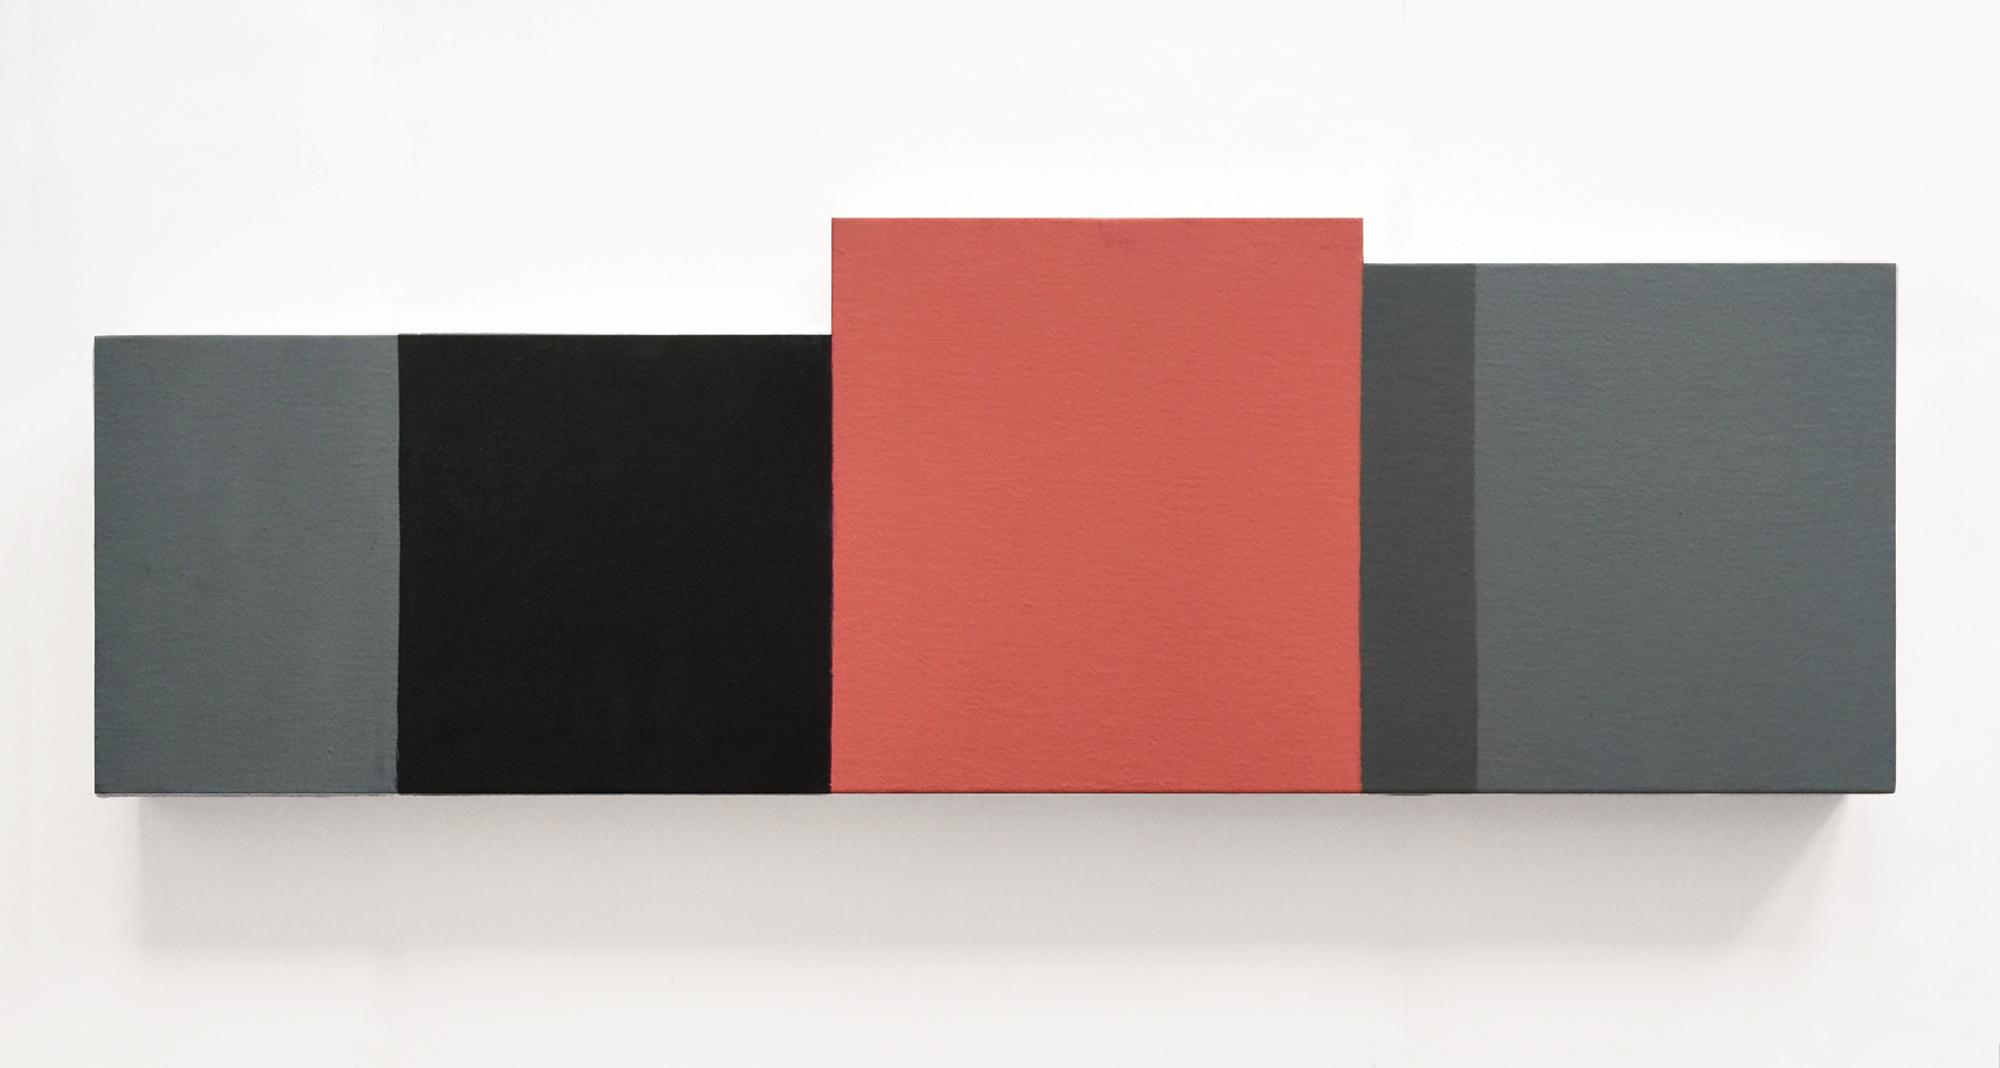 David Row - Intersection